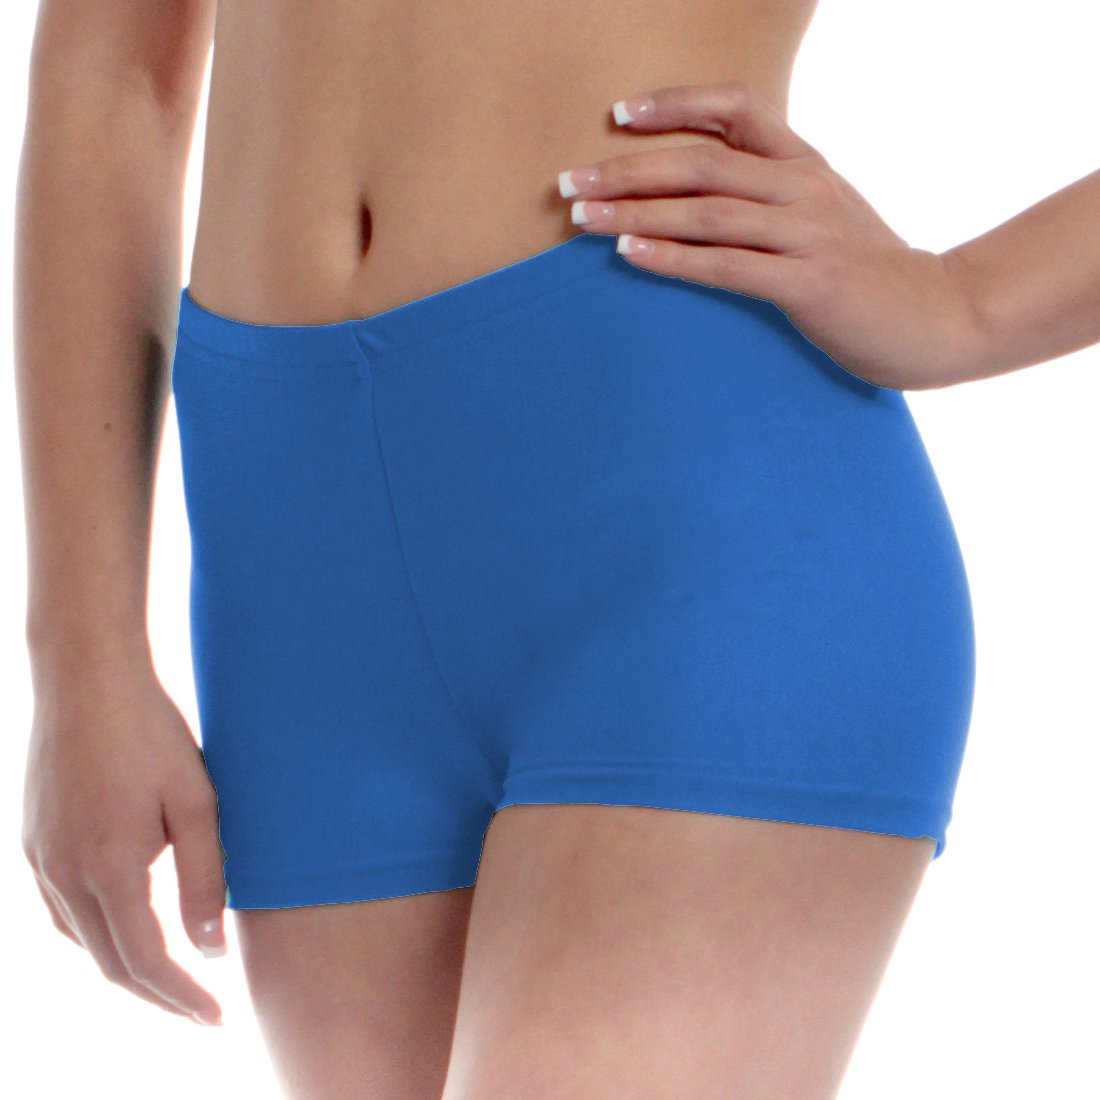 Mens Long Dance Shorts Extra Small Blue by B Dancewear Adult Sizes by Bailar Dancewear